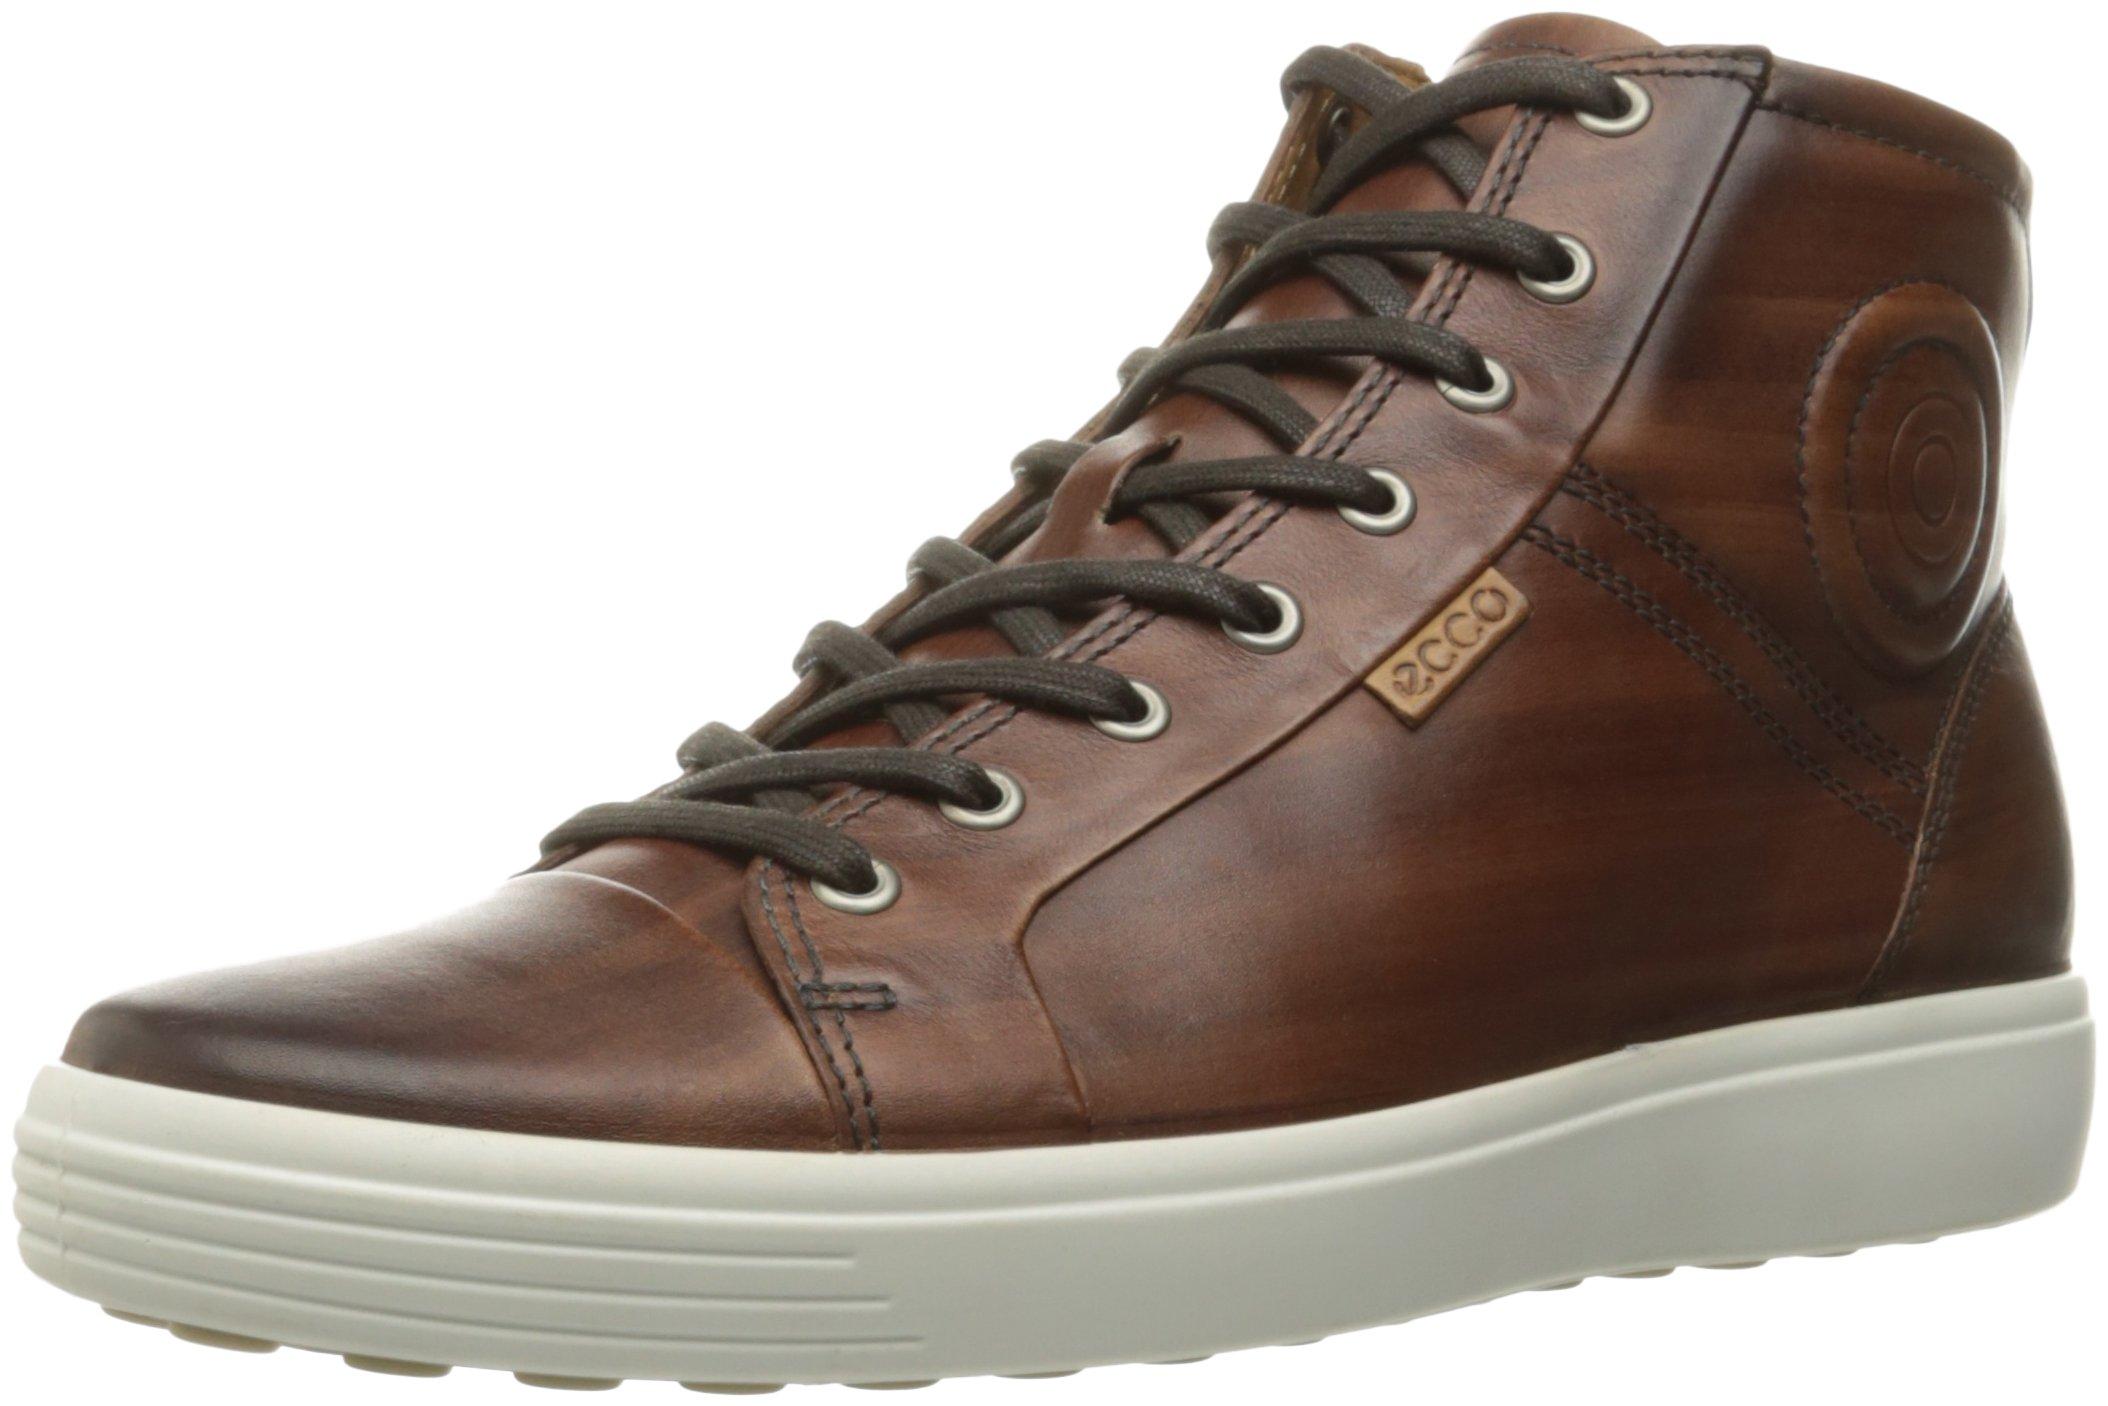 Ecco Hautes HommeMarron1283whisky46 Eu 7Sneakers Soft WdQCBexro